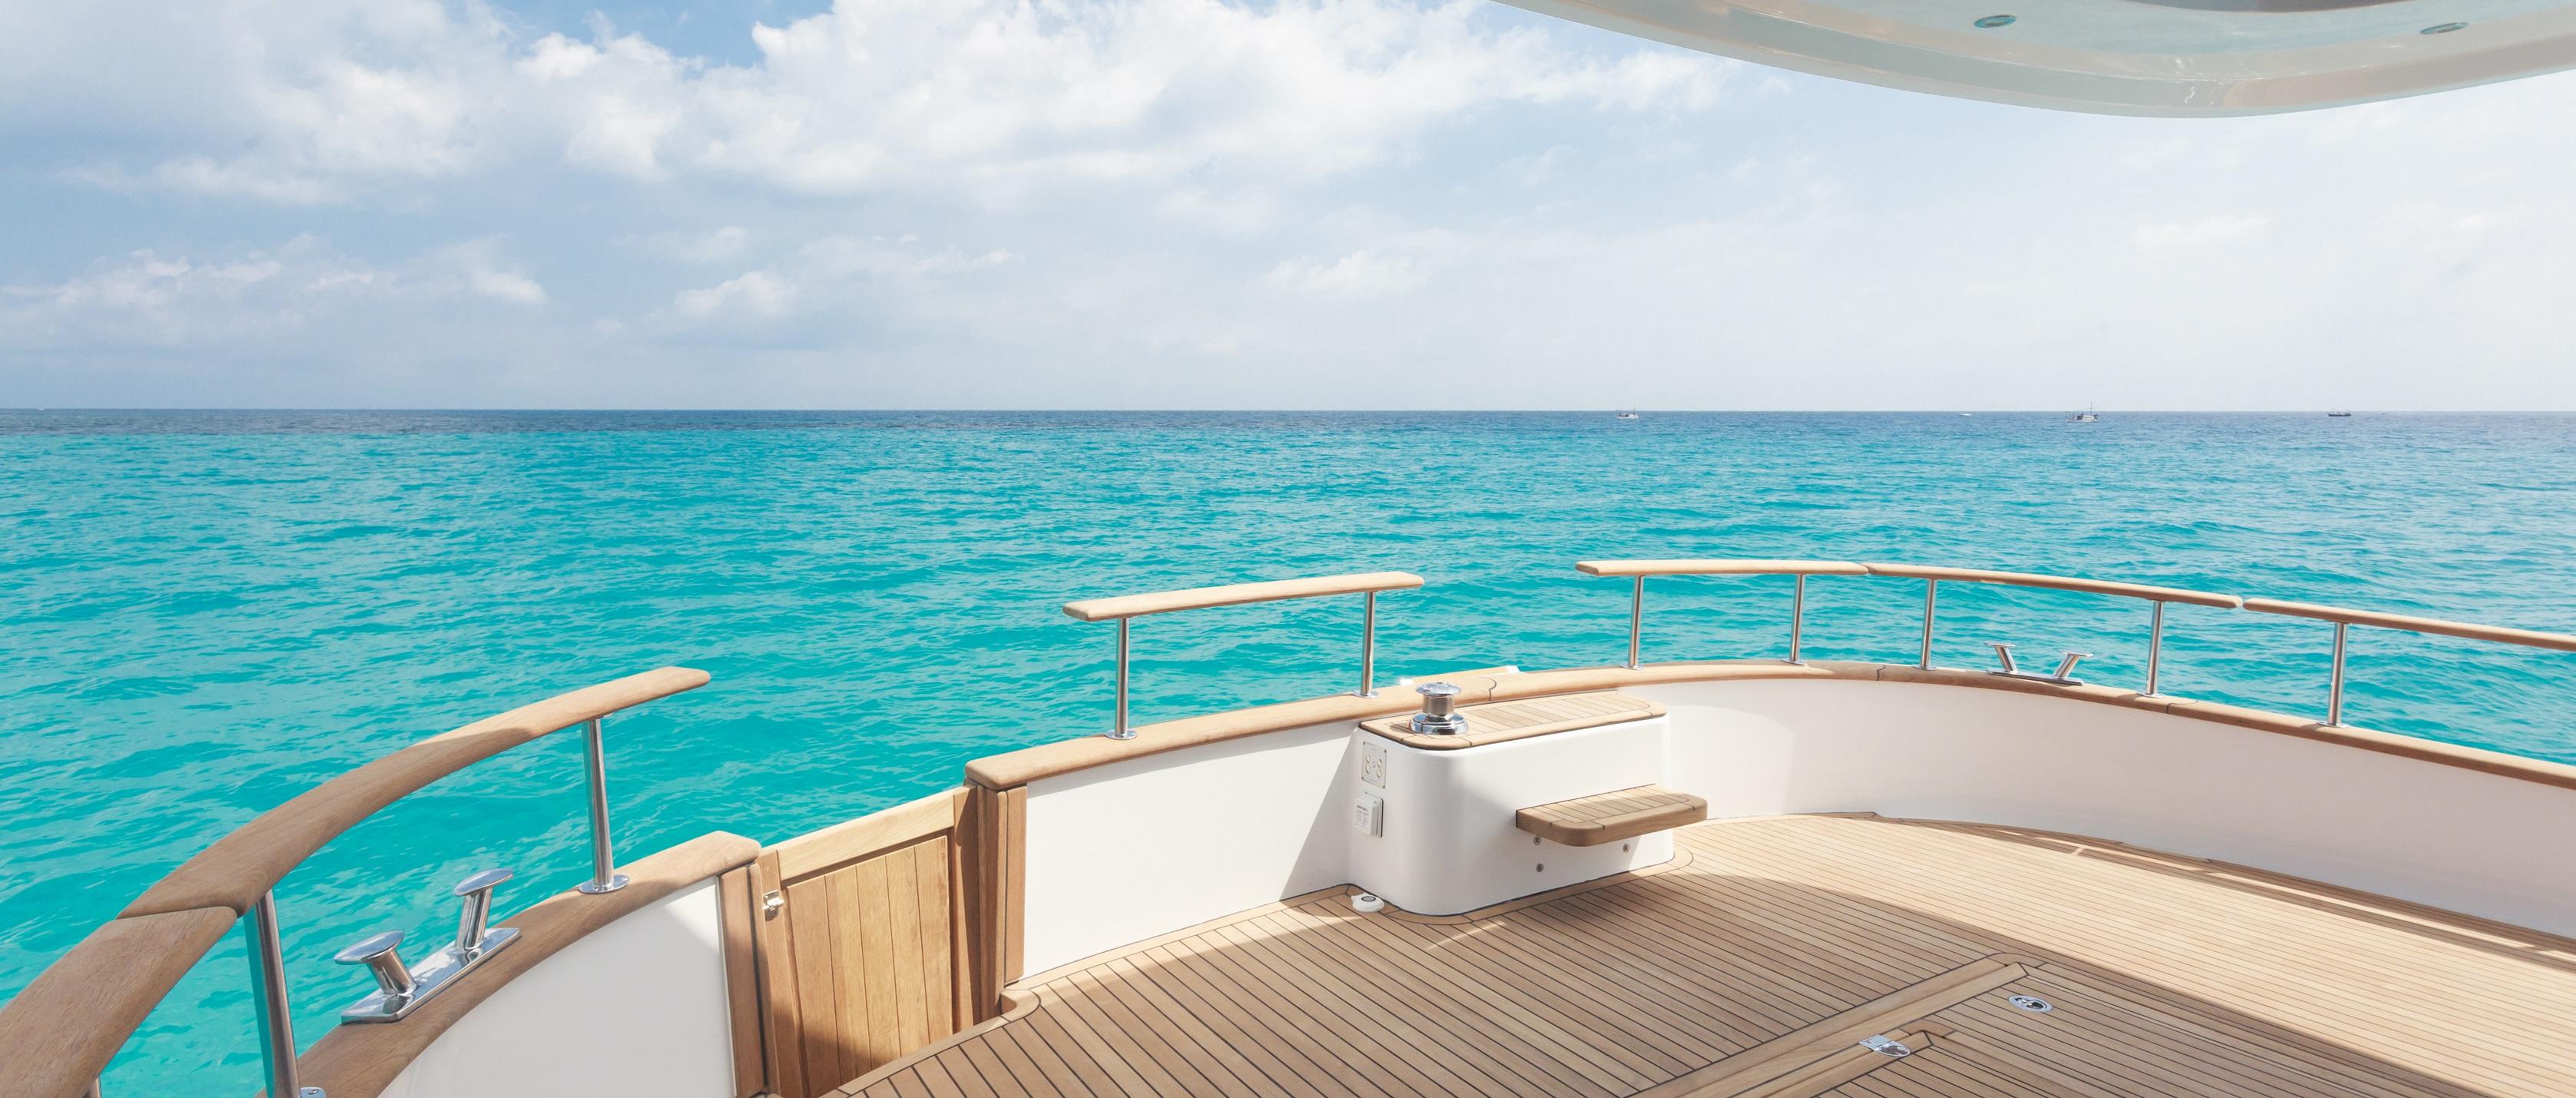 contact Minorca Yachts